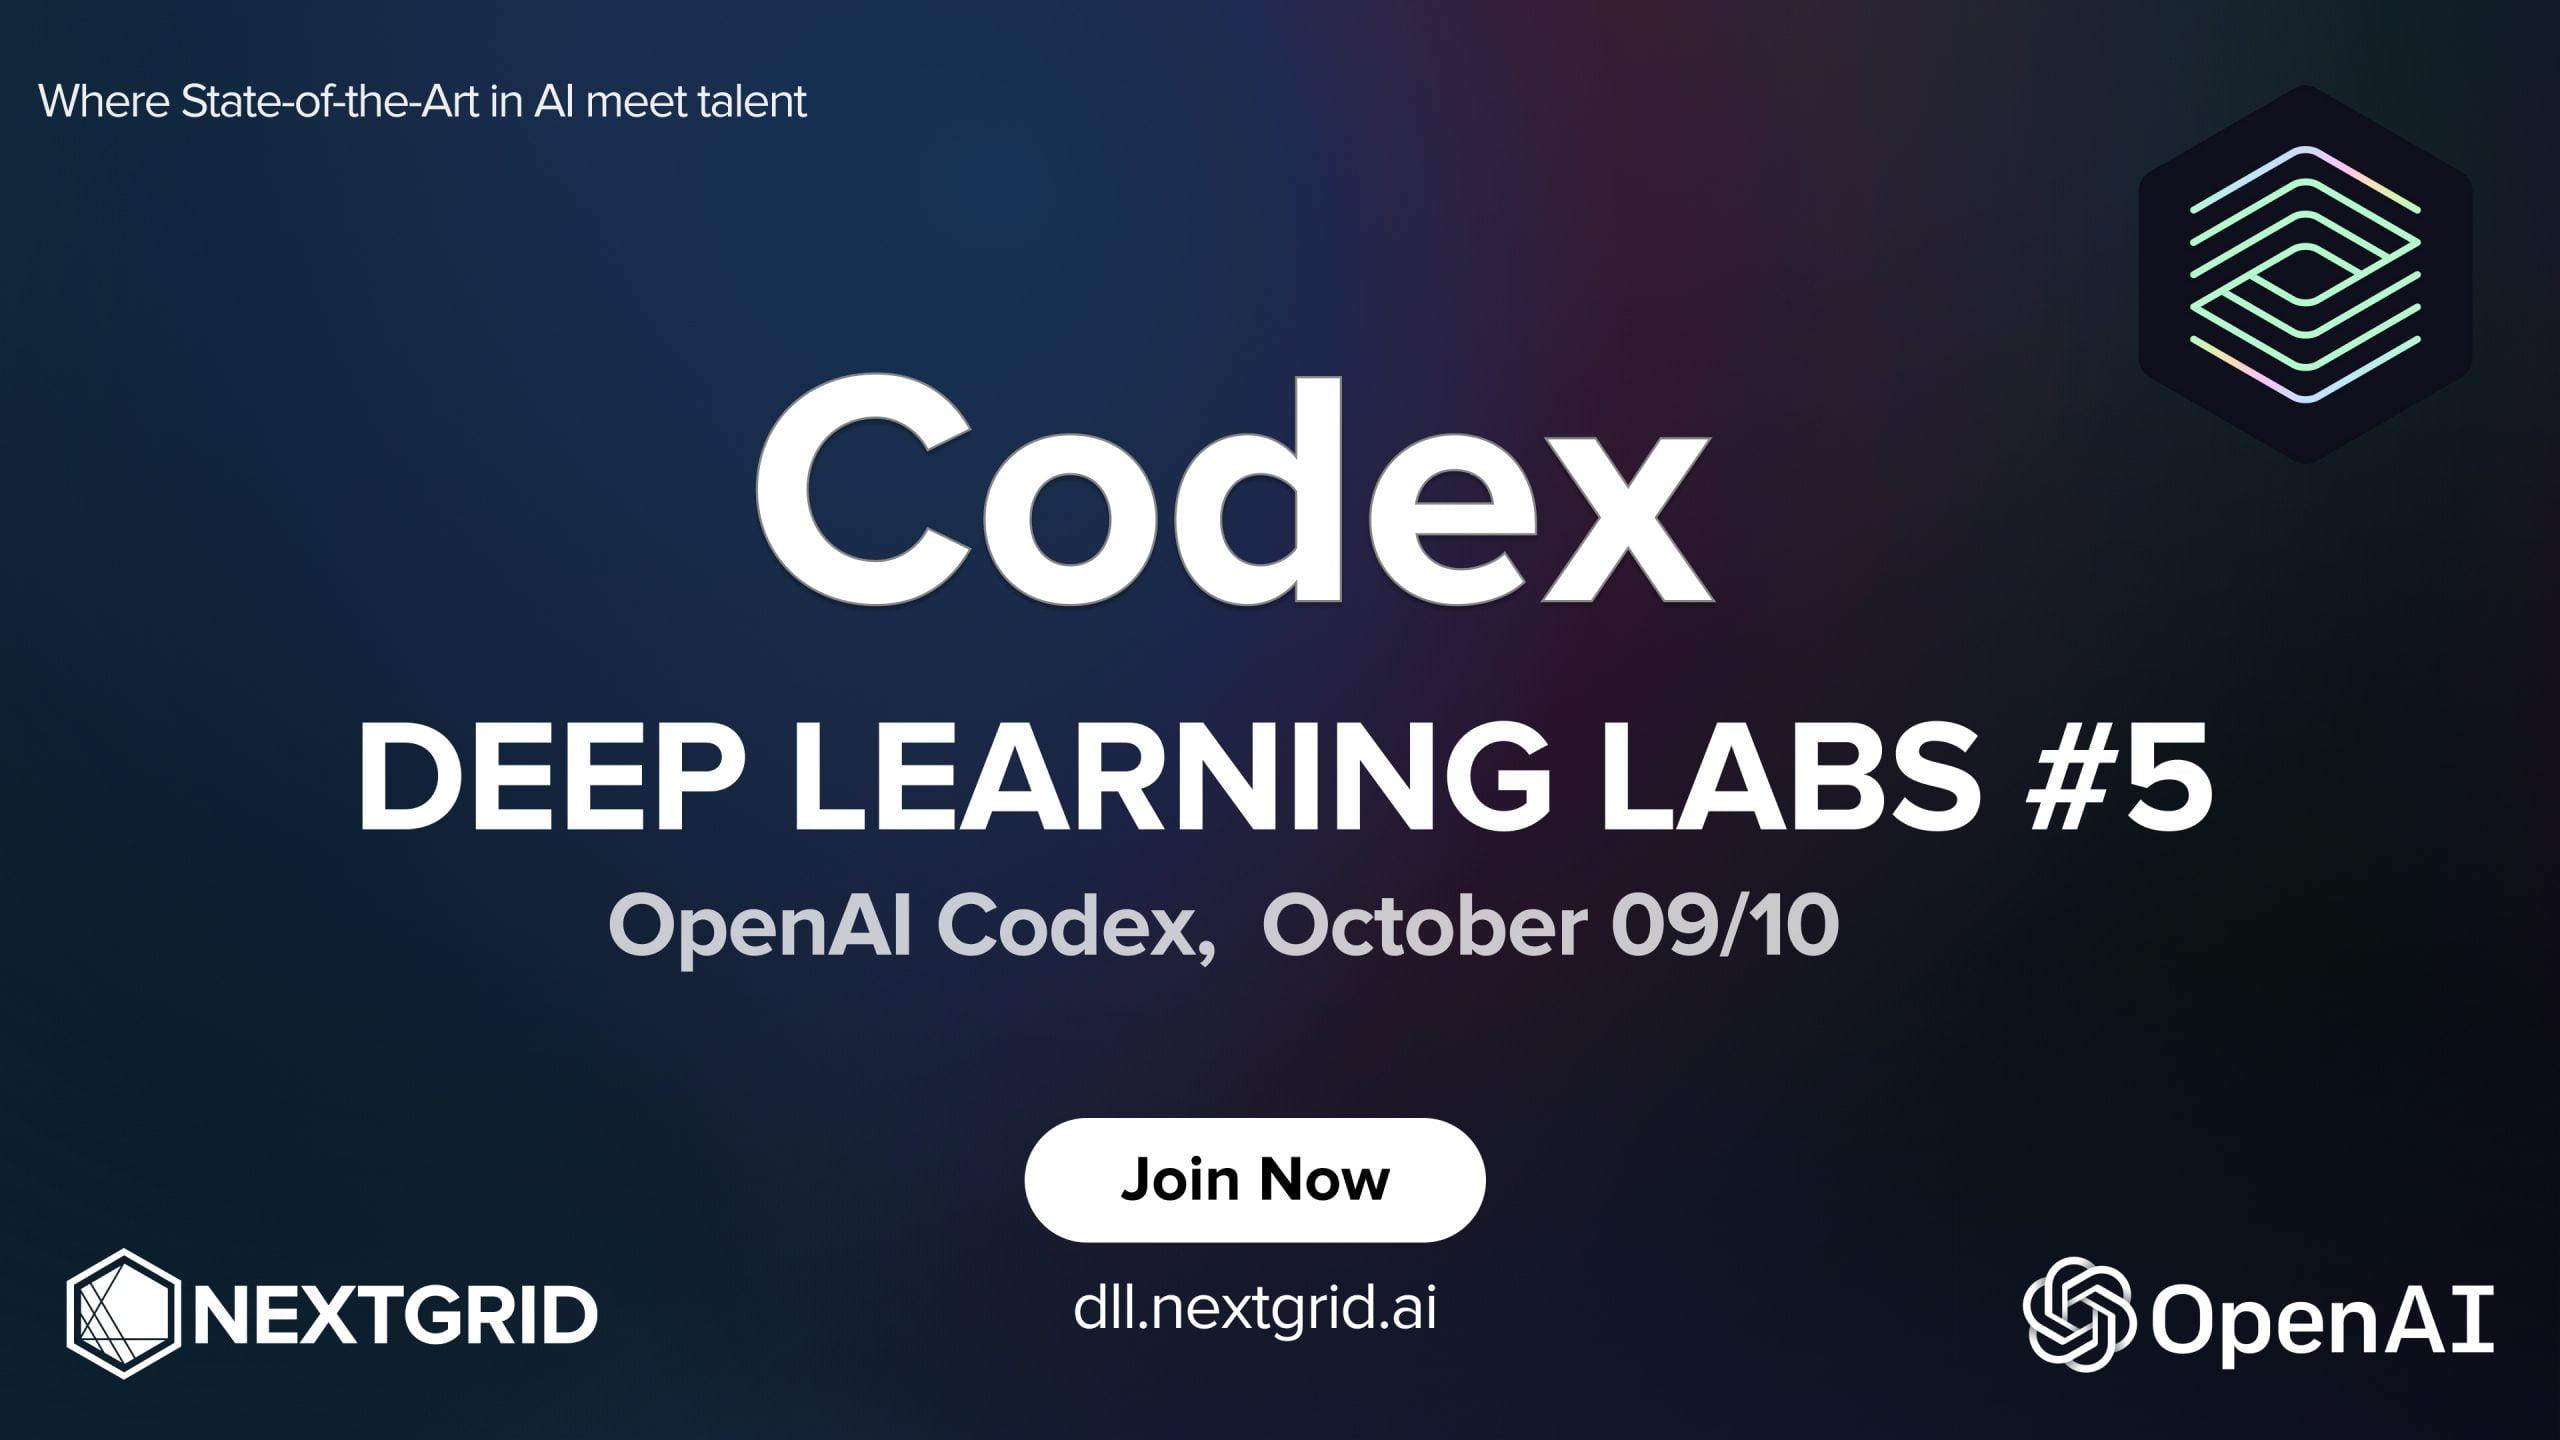 Deep Learning Labs #5, OpenAI Codex